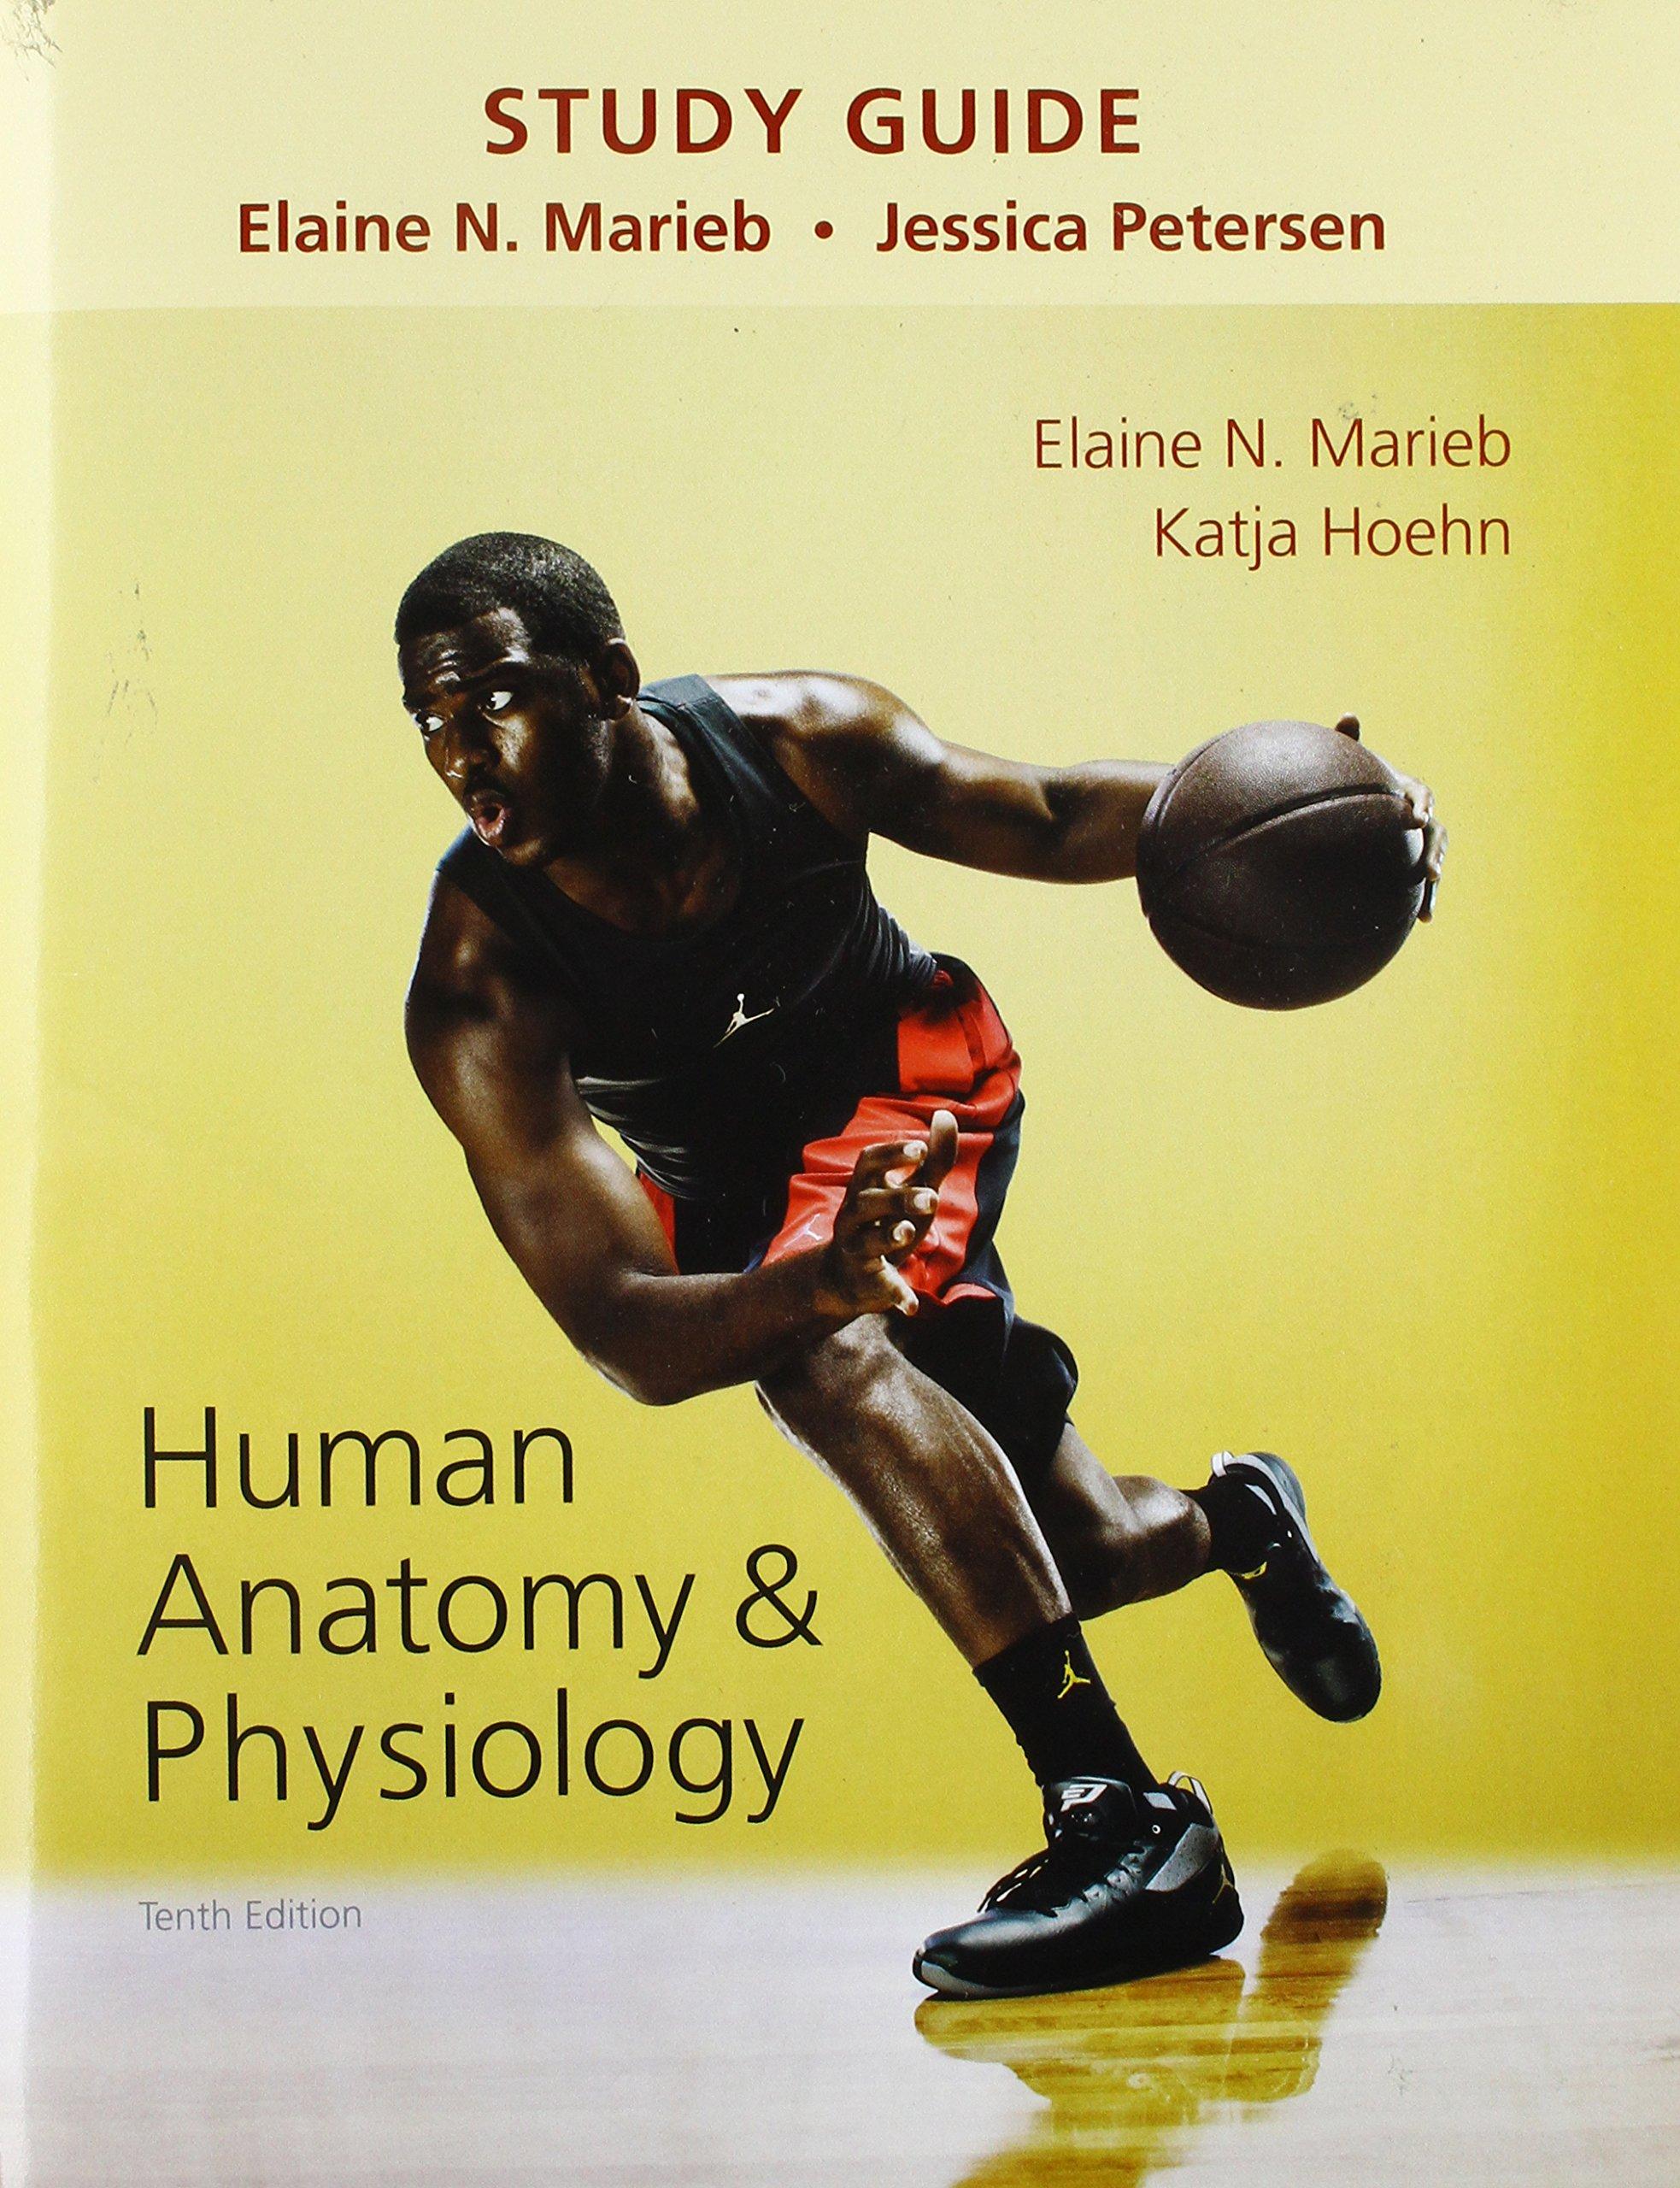 Study Guide for Human Anatomy & Physiology: Elaine N. Marieb, Katja ...